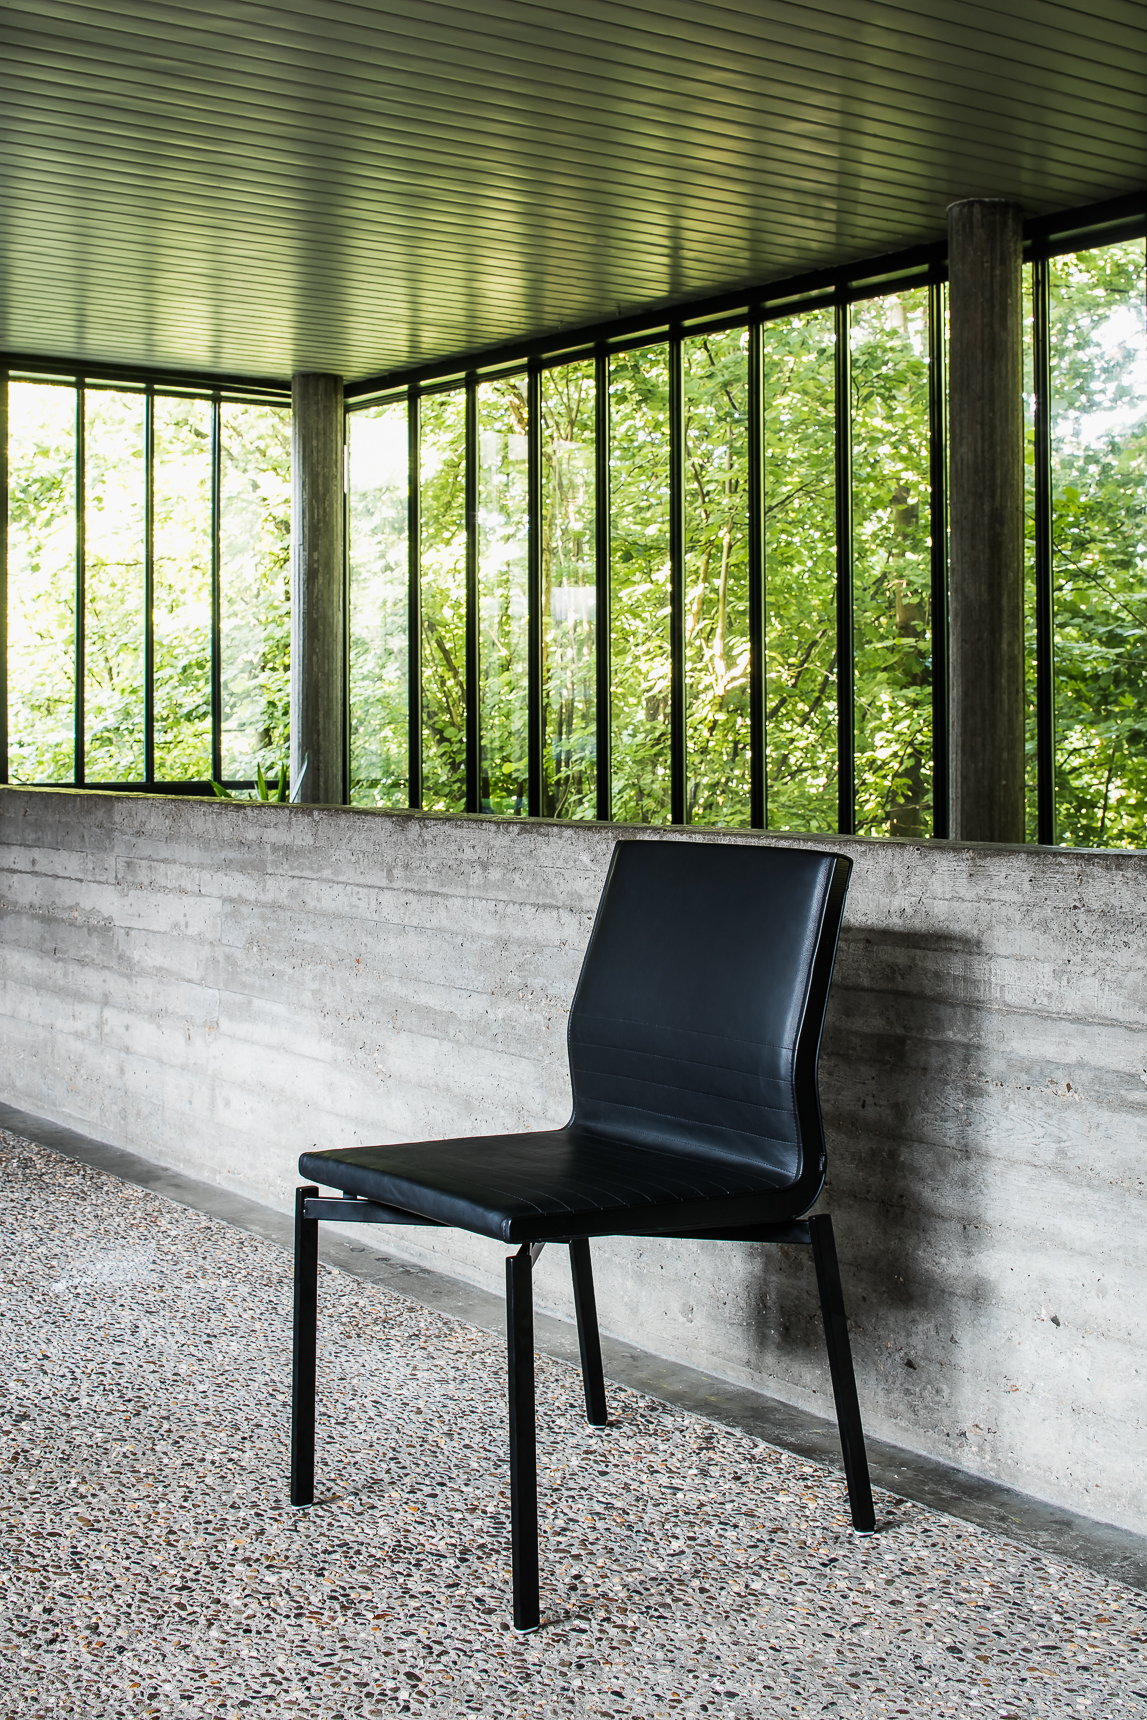 Vvda 2018 Chair For Bulo Thomas De Bruyne 2